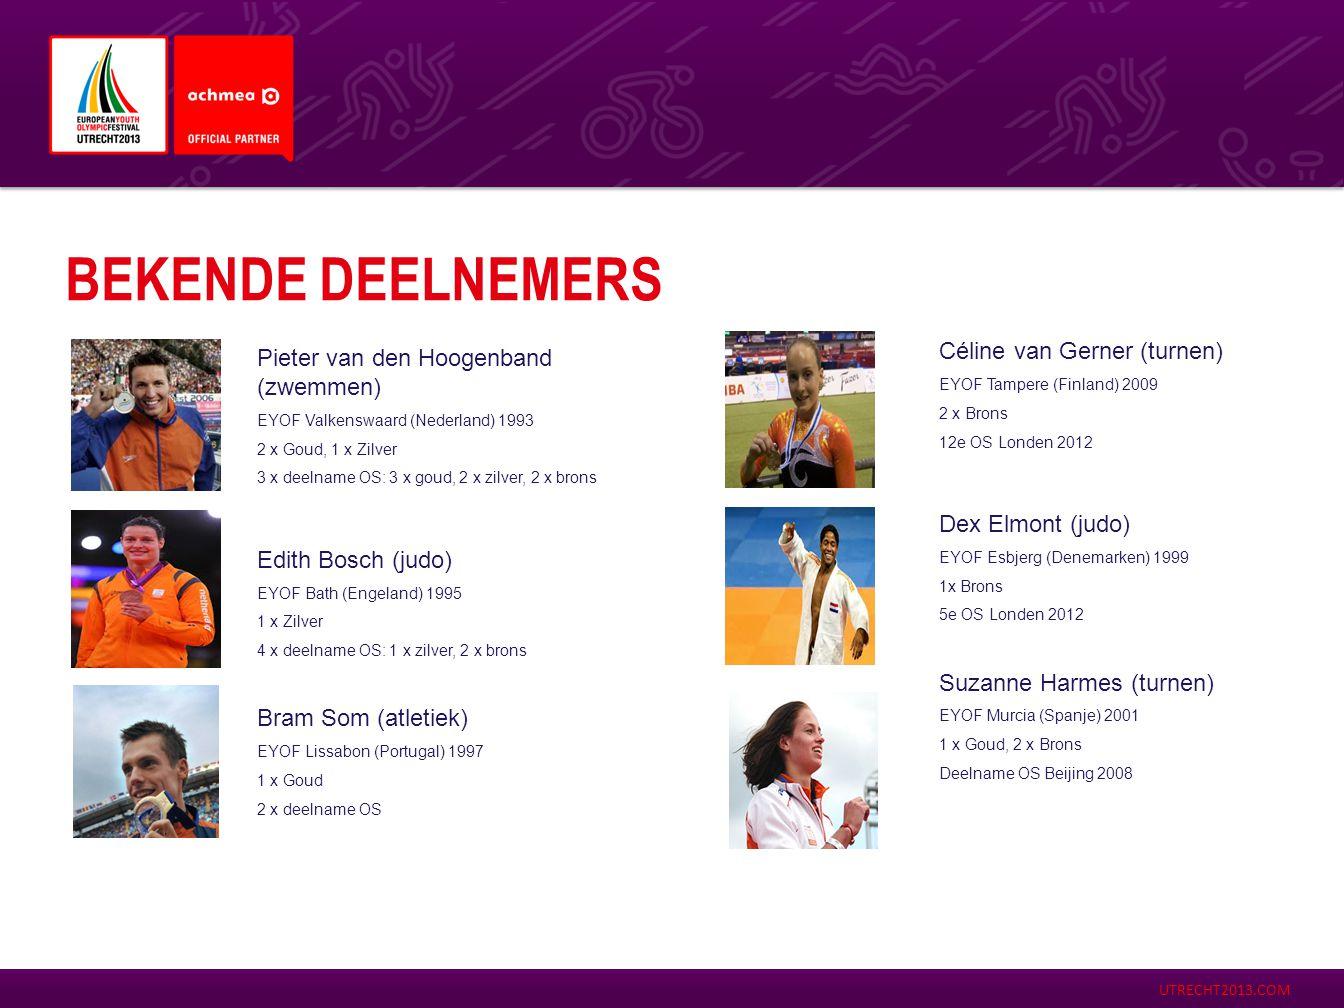 UTRECHT2013.COM Céline van Gerner (turnen) EYOF Tampere (Finland) 2009 2 x Brons 12e OS Londen 2012 Dex Elmont (judo) EYOF Esbjerg (Denemarken) 1999 1